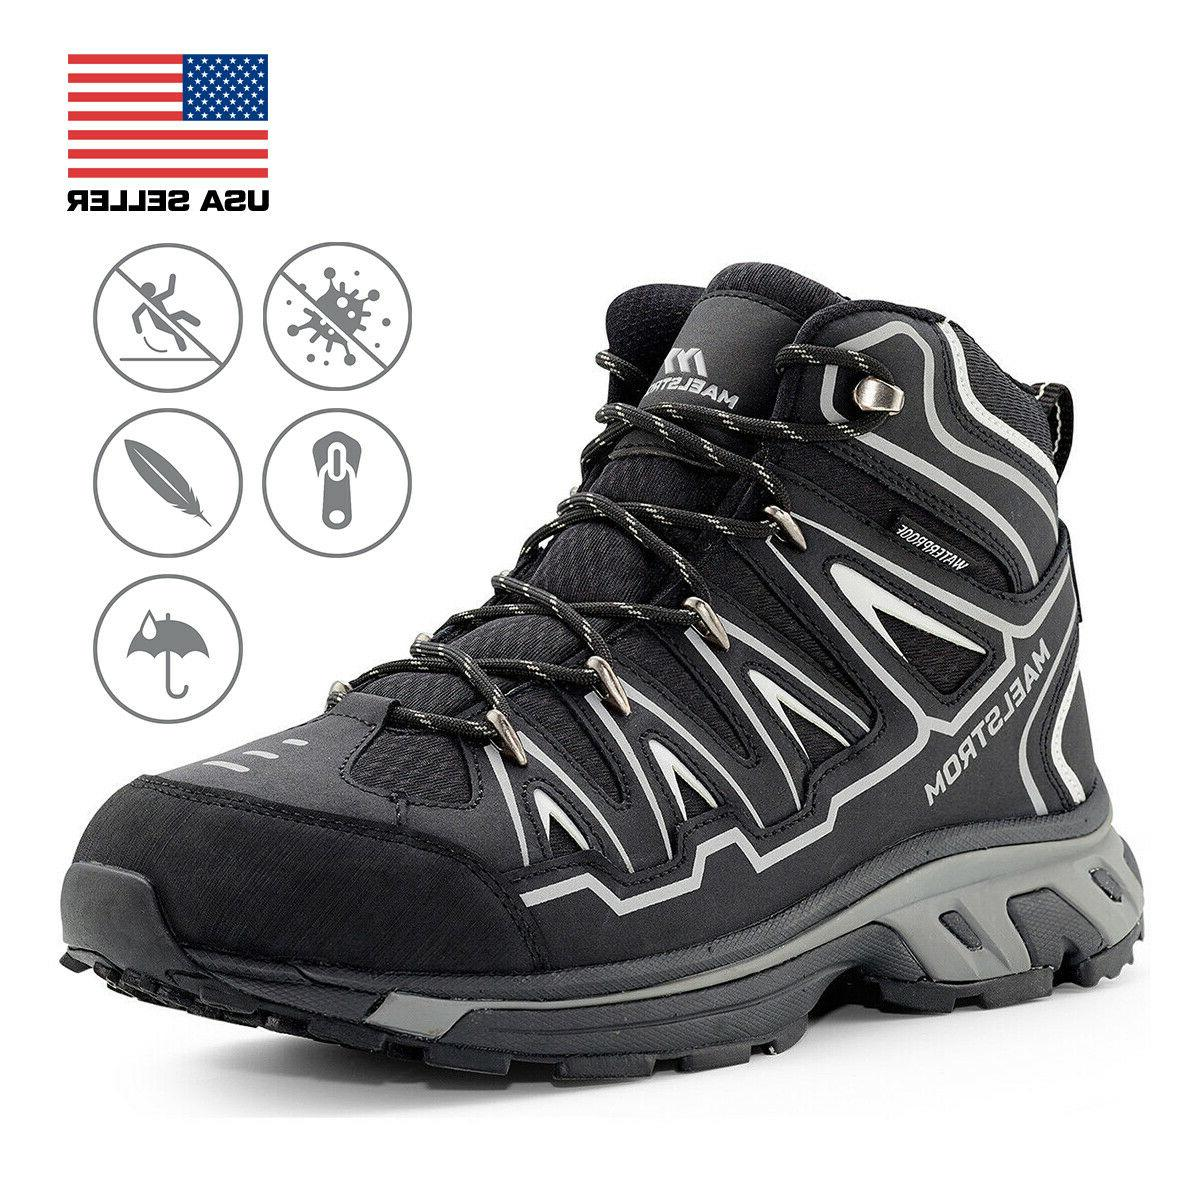 Maelstrom Men's Waterproof Hiking Boots in